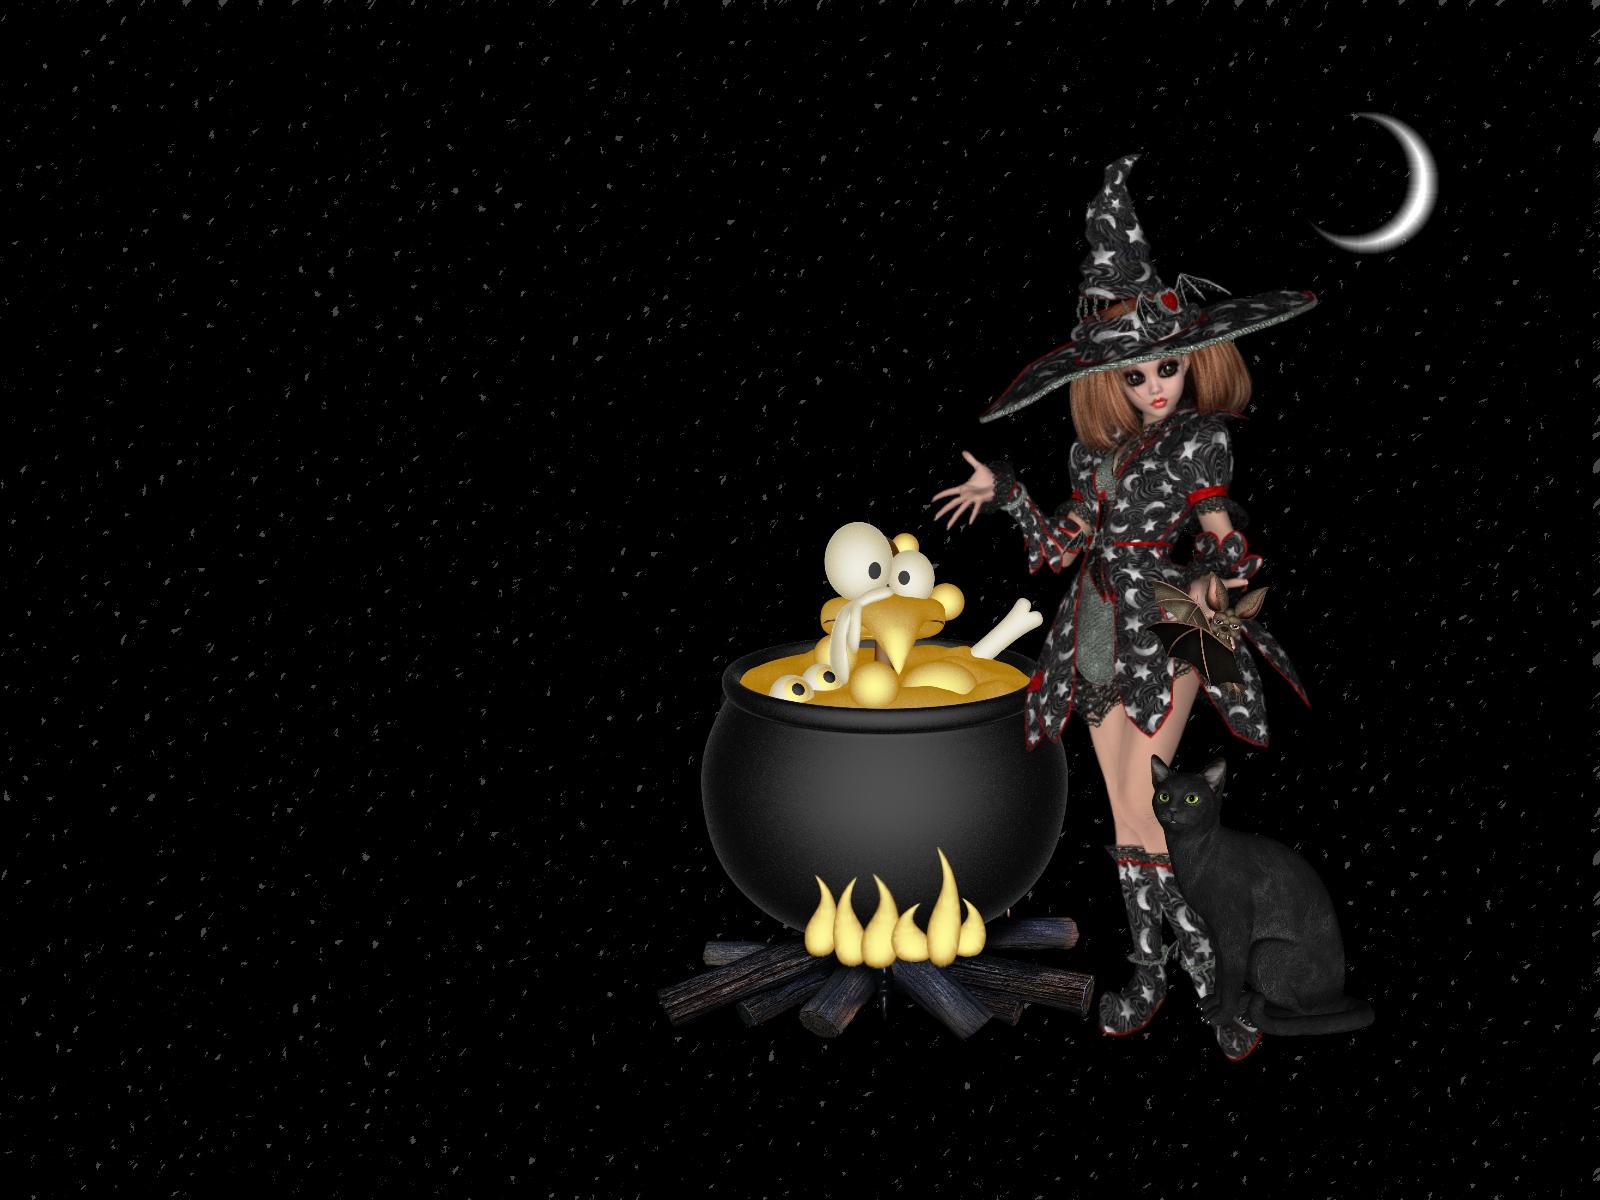 45] Halloween Animated Desktop Wallpaper on WallpaperSafari 1600x1200